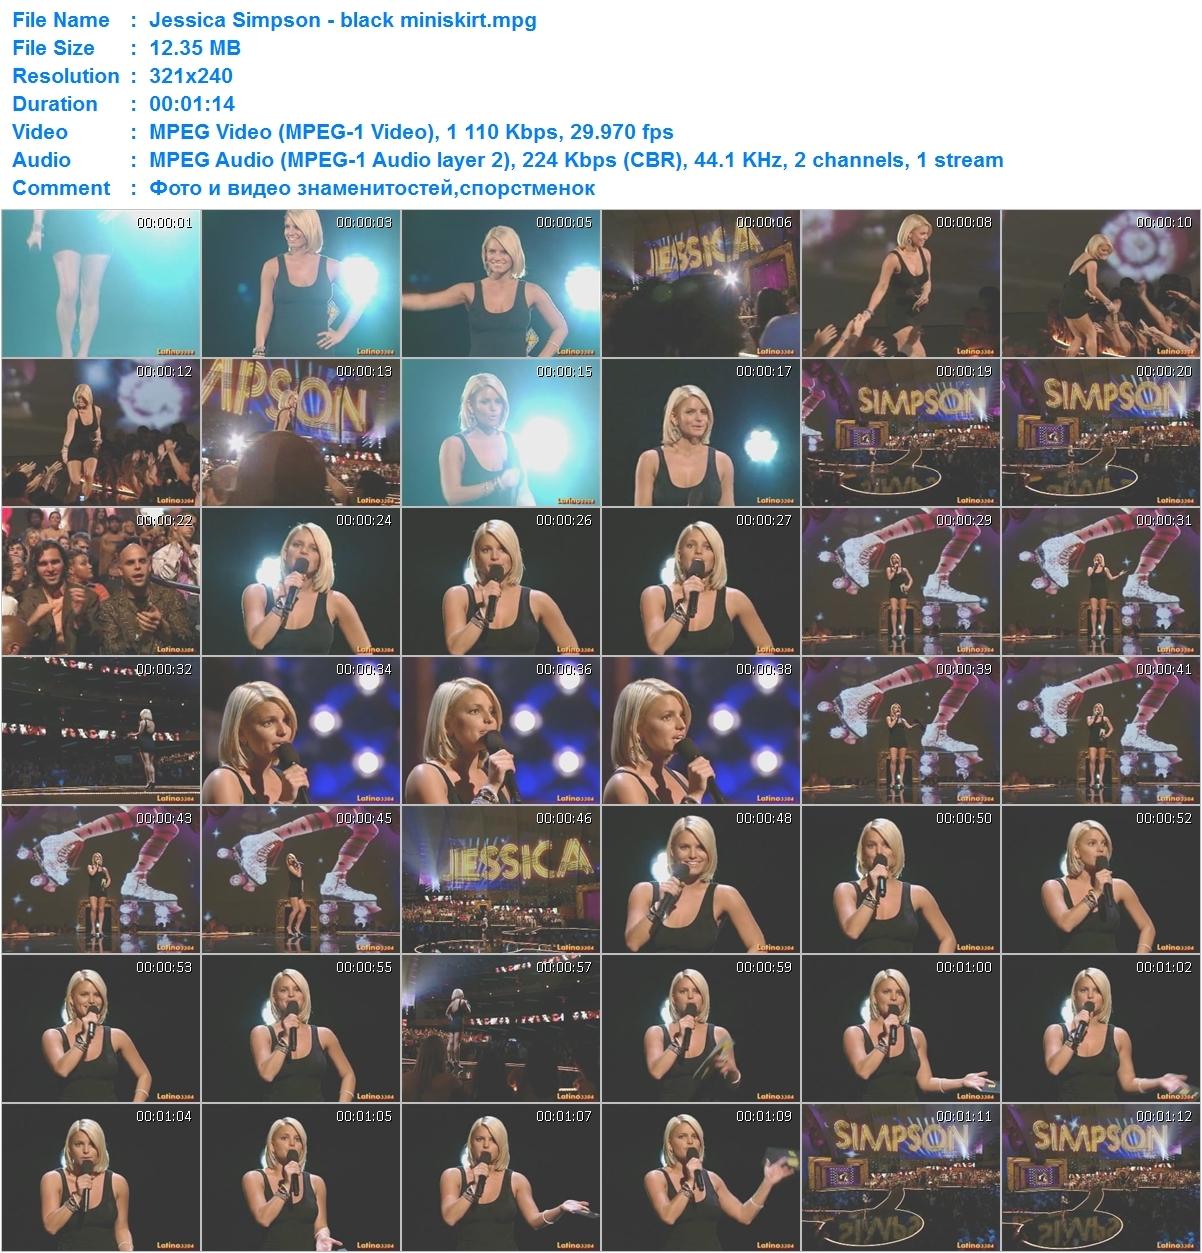 http://i3.imageban.ru/out/2011/02/21/0c041397a5b7baf7b95c681e02a40899.jpg